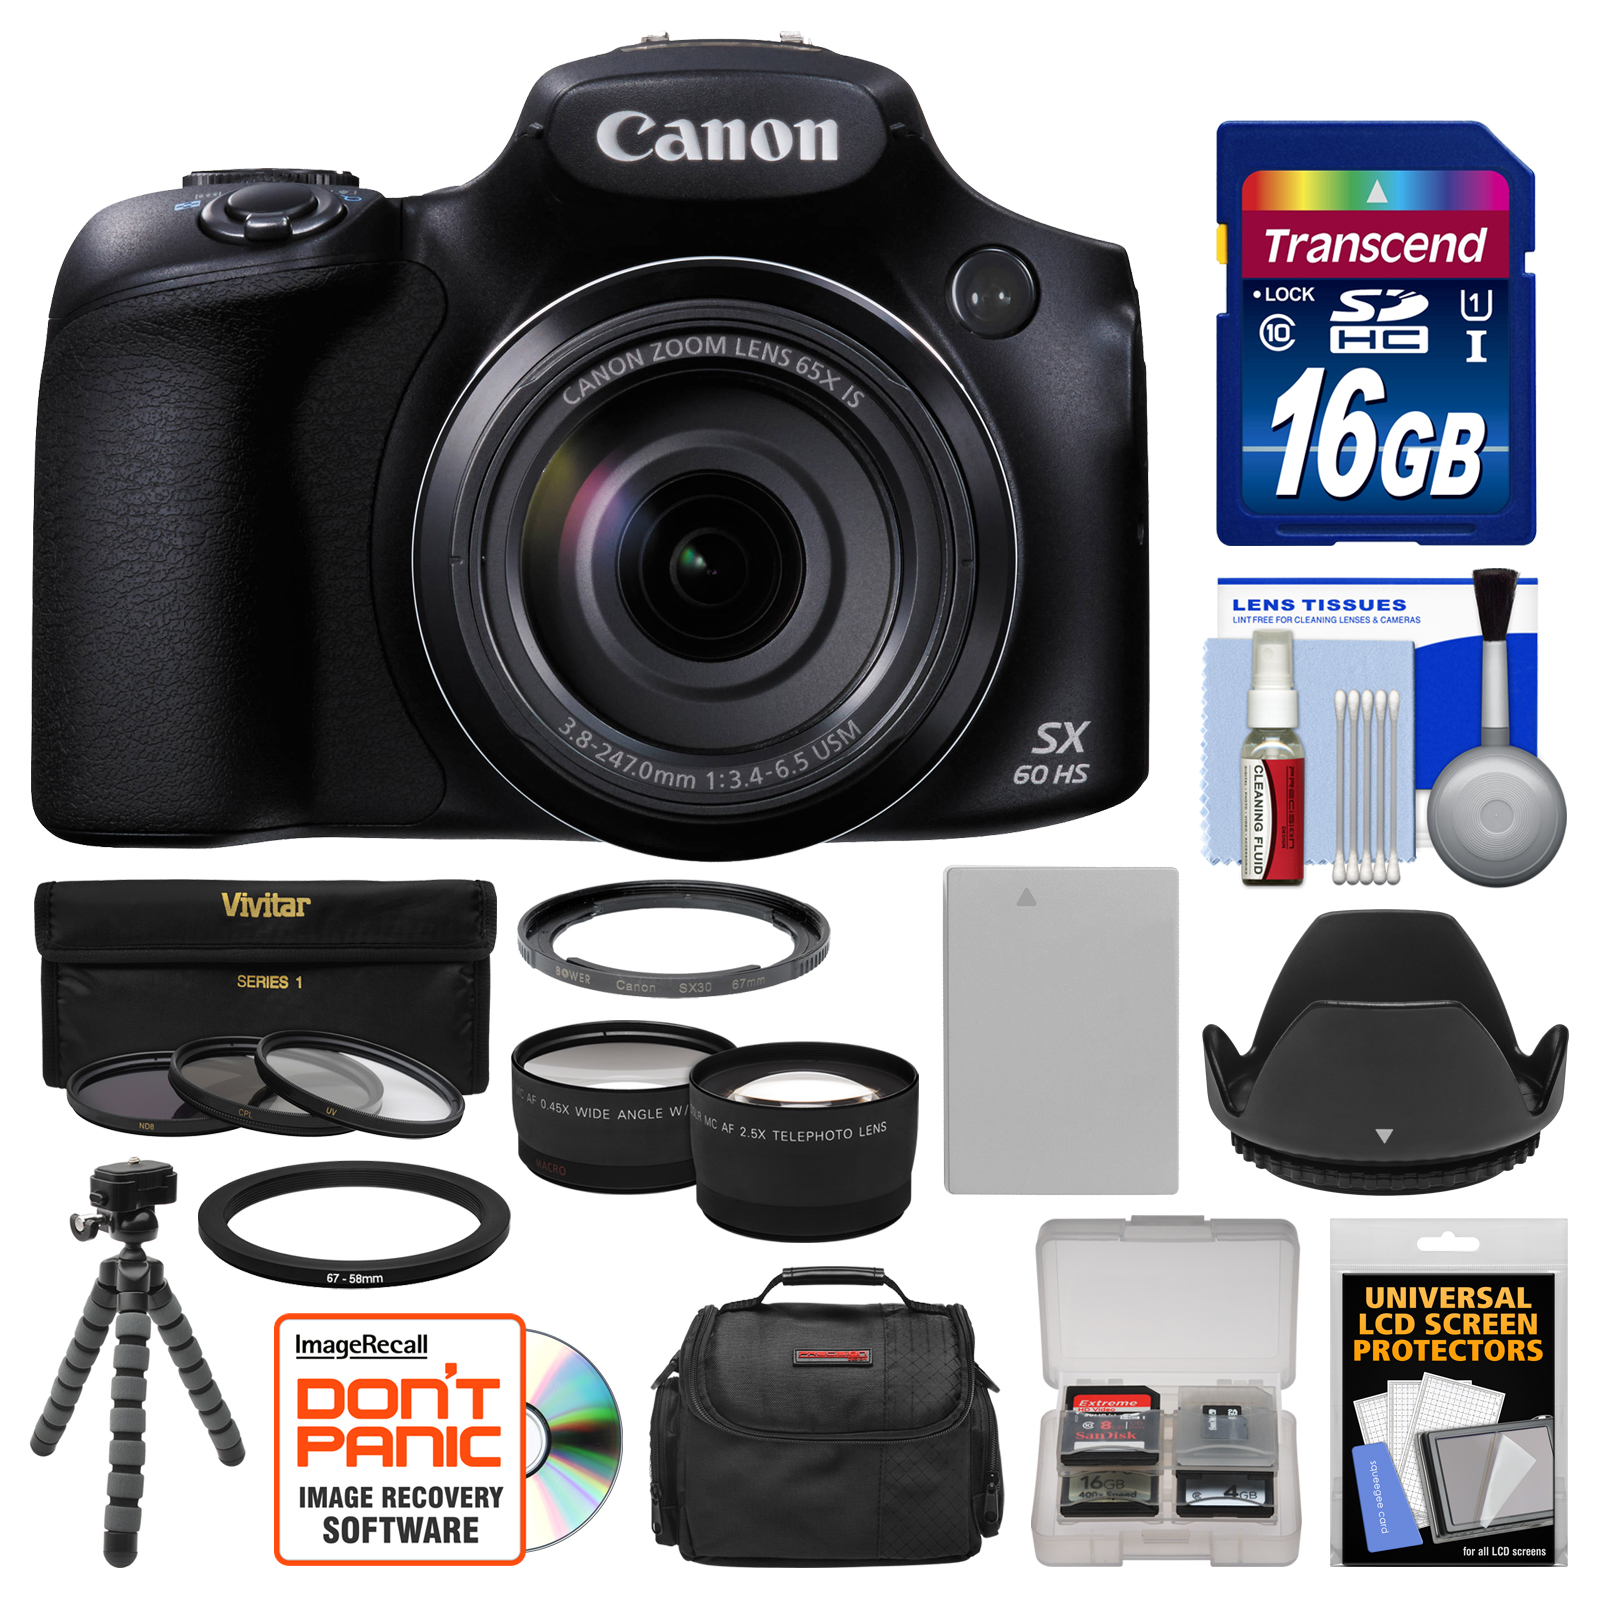 Canon PowerShot SX60 HS Wi-Fi Digital Camera with 16GB Ca...